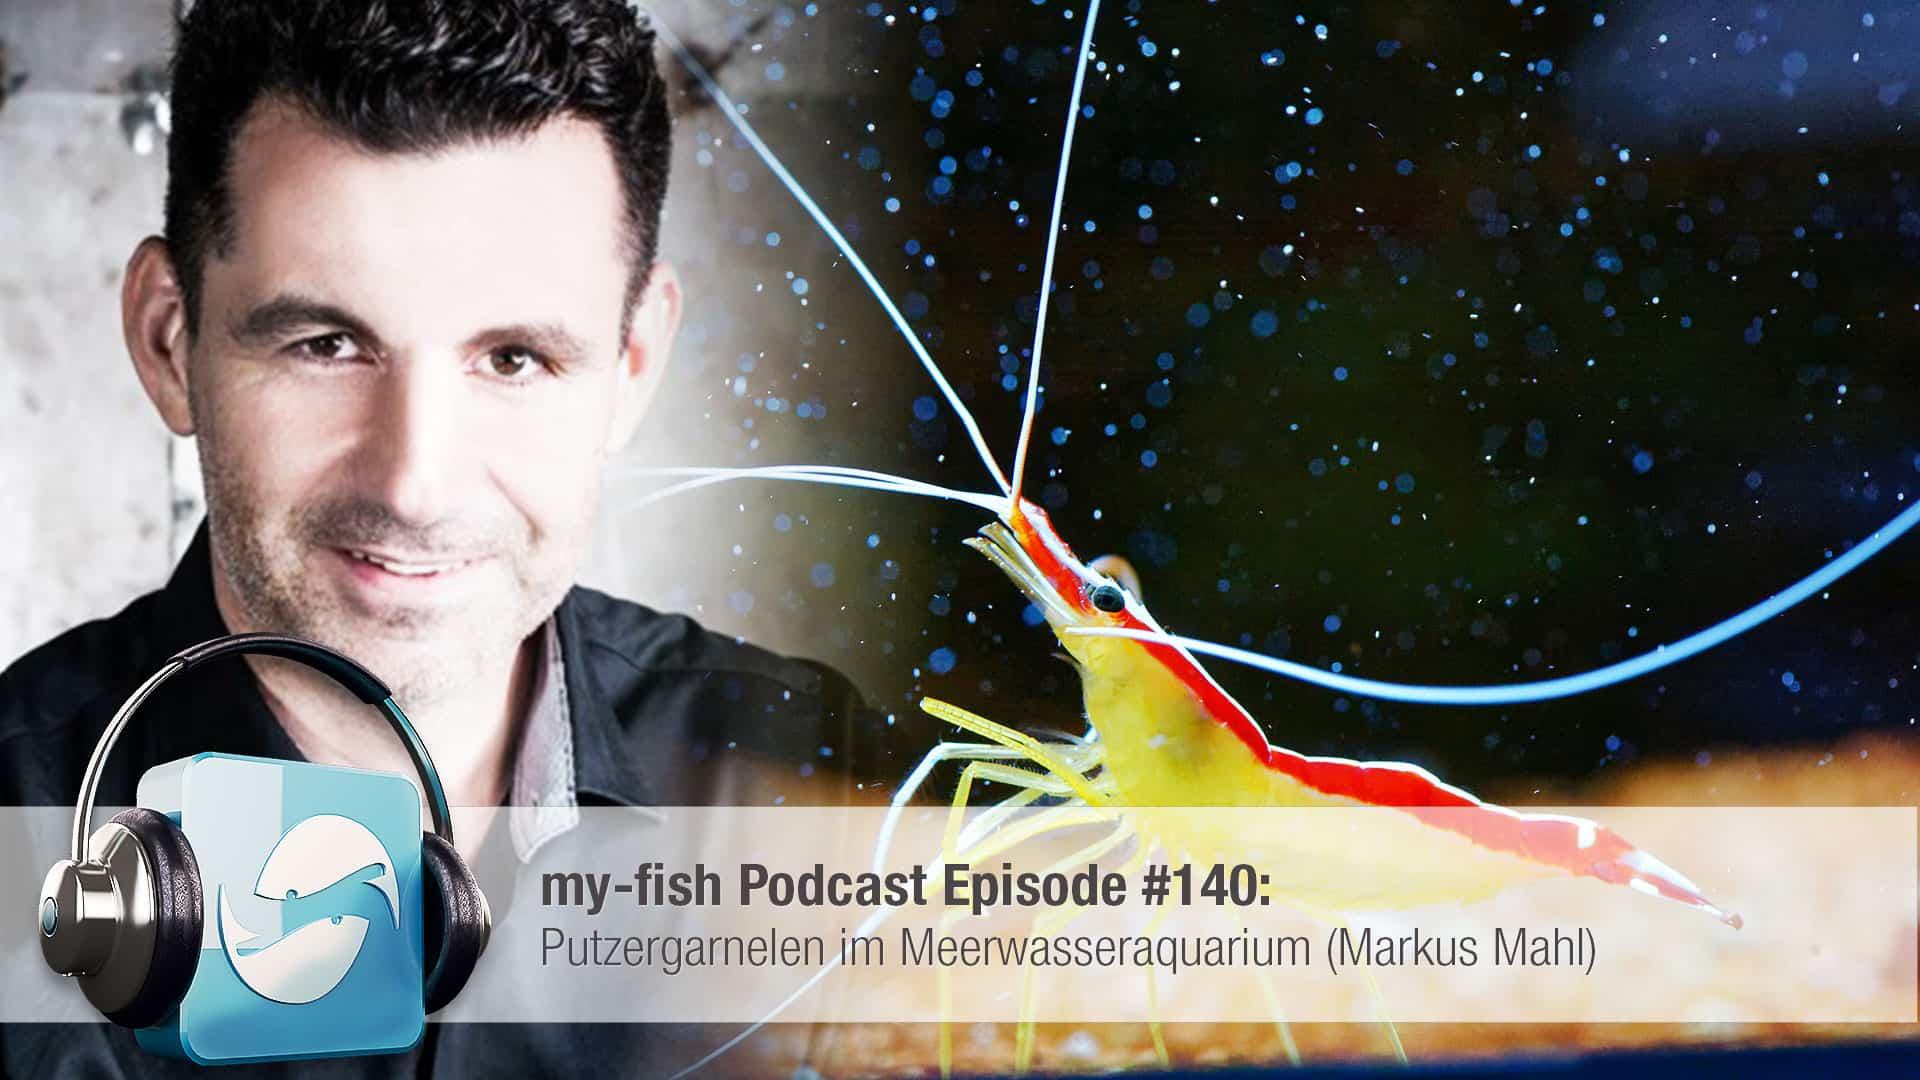 Podcast Episode #140: Putzergarnelen im Meerwasseraquarium (Markus Mahl) 1